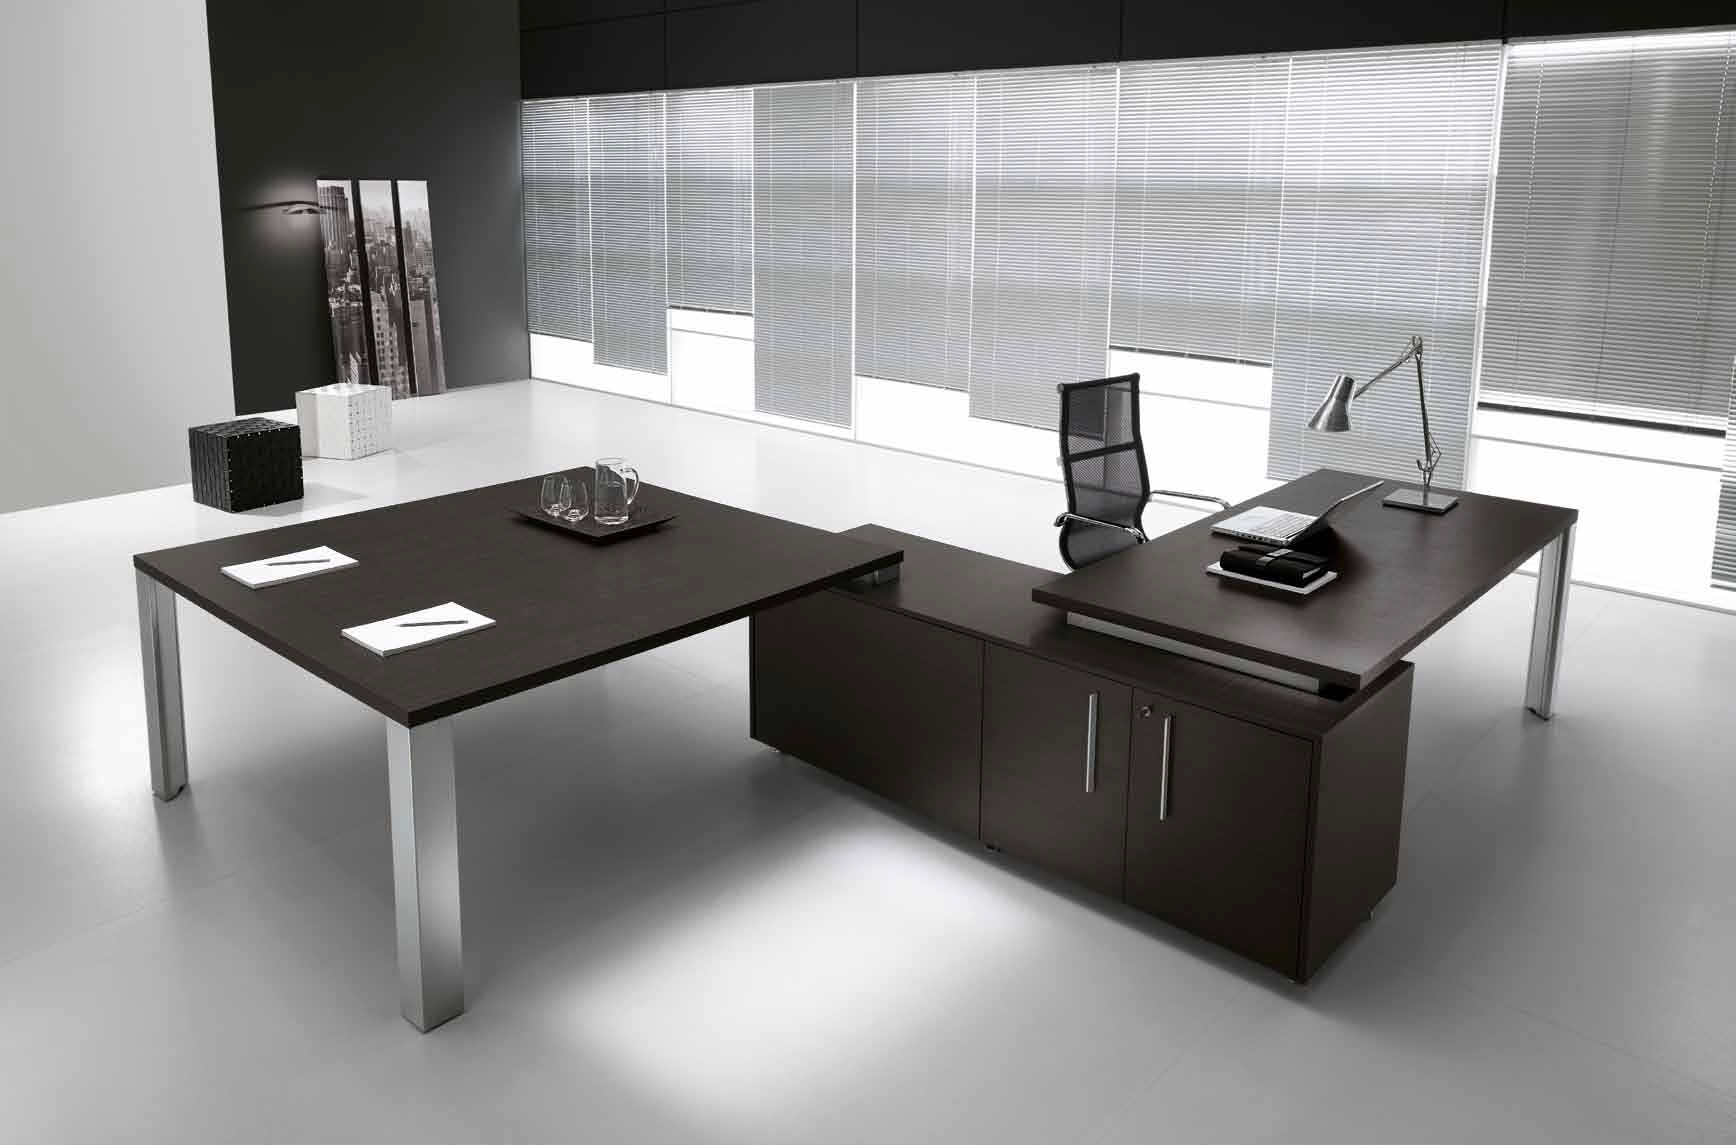 Arredo ufficio - Ikea arredo ufficio ...